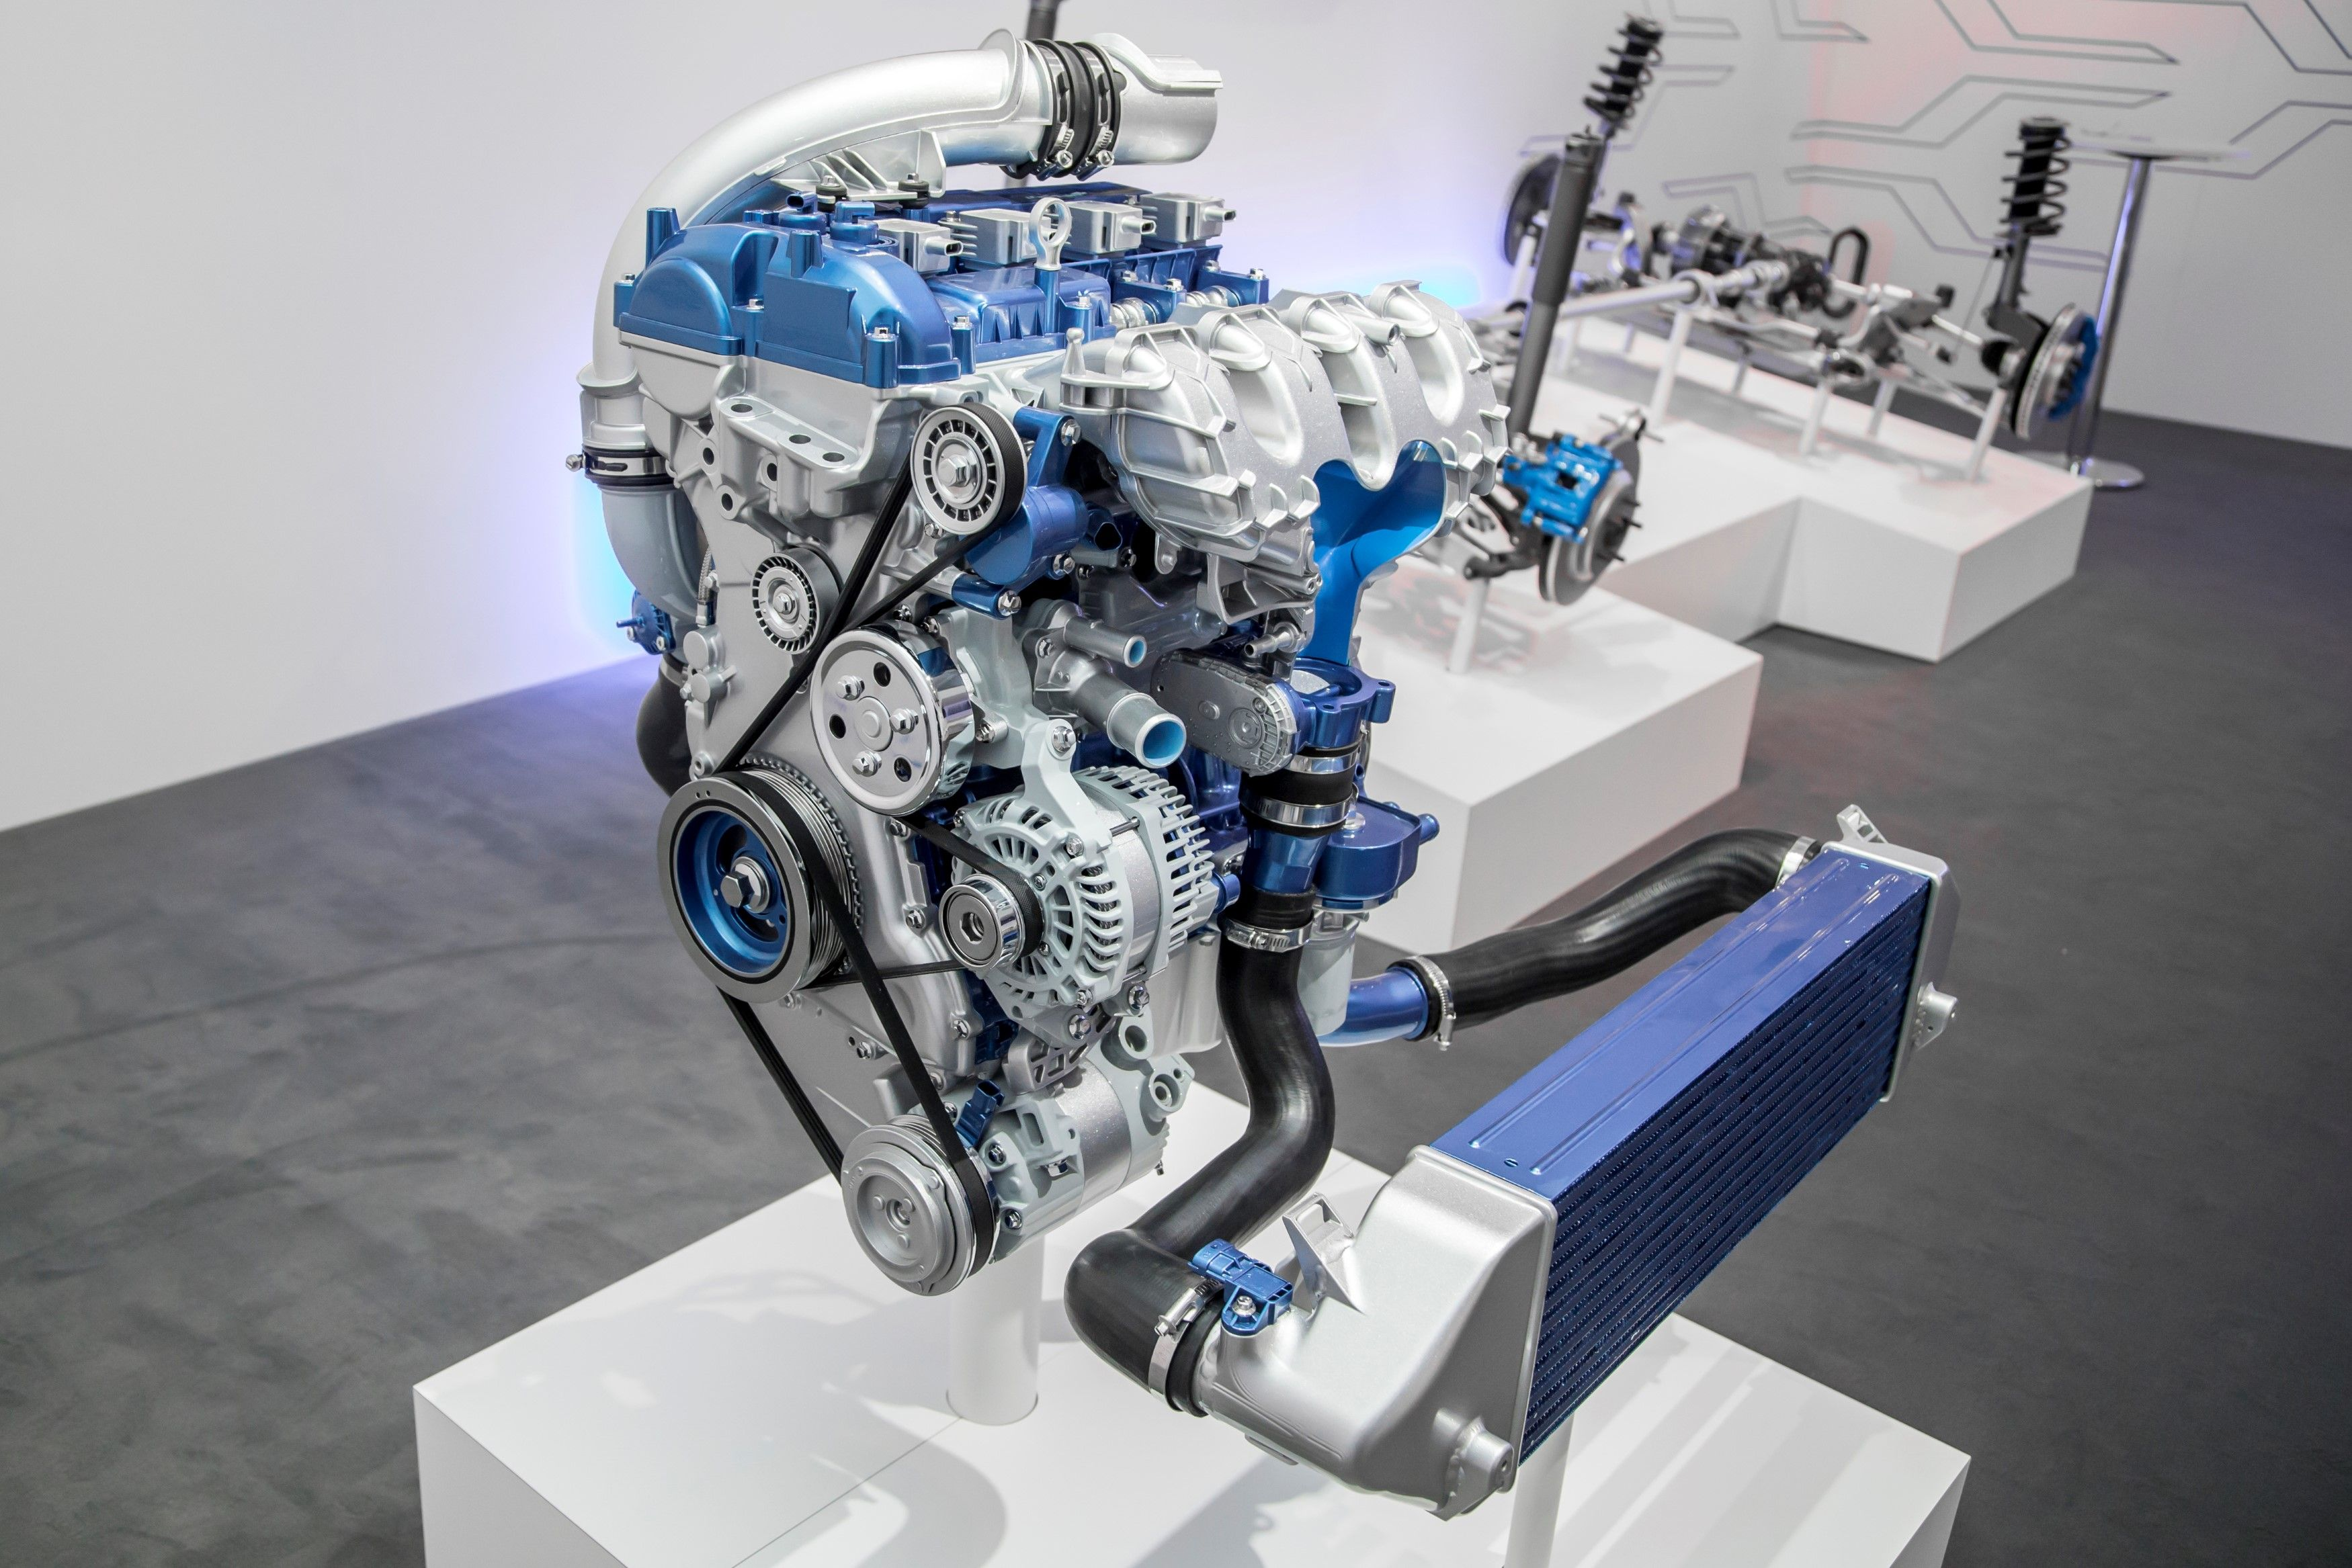 2.3l DOHC D.I. turbocharged 4 cylinder EcoBoost for 2016 Ford Focus RS.